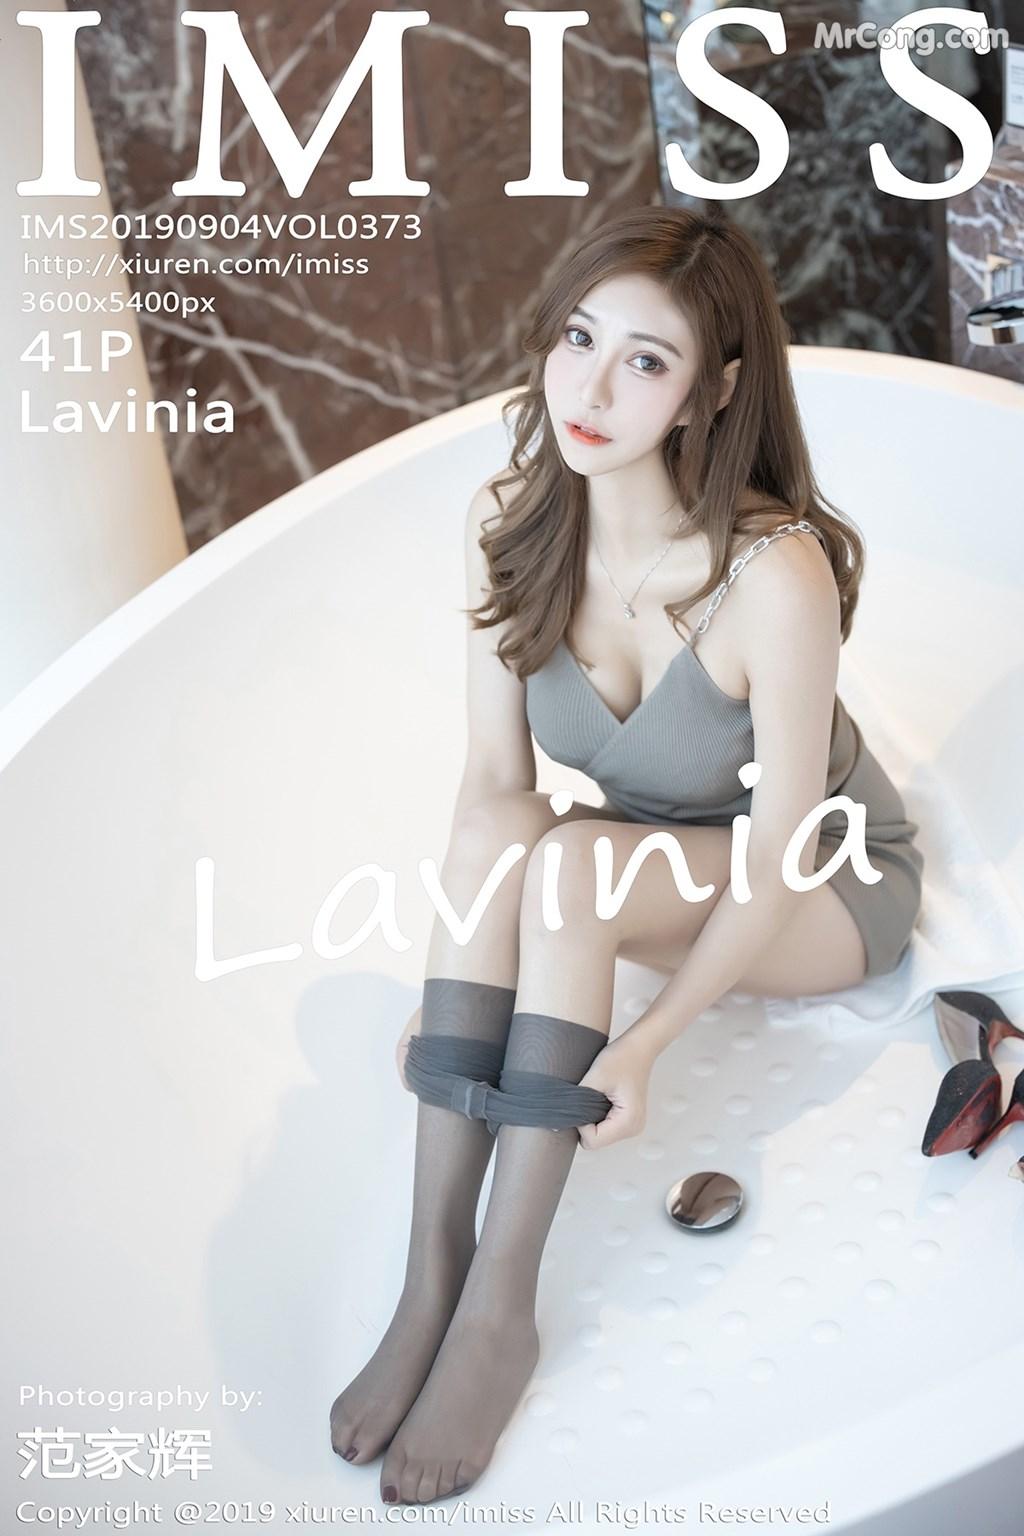 IMISS Vol.373: Lavinia (42 ảnh)